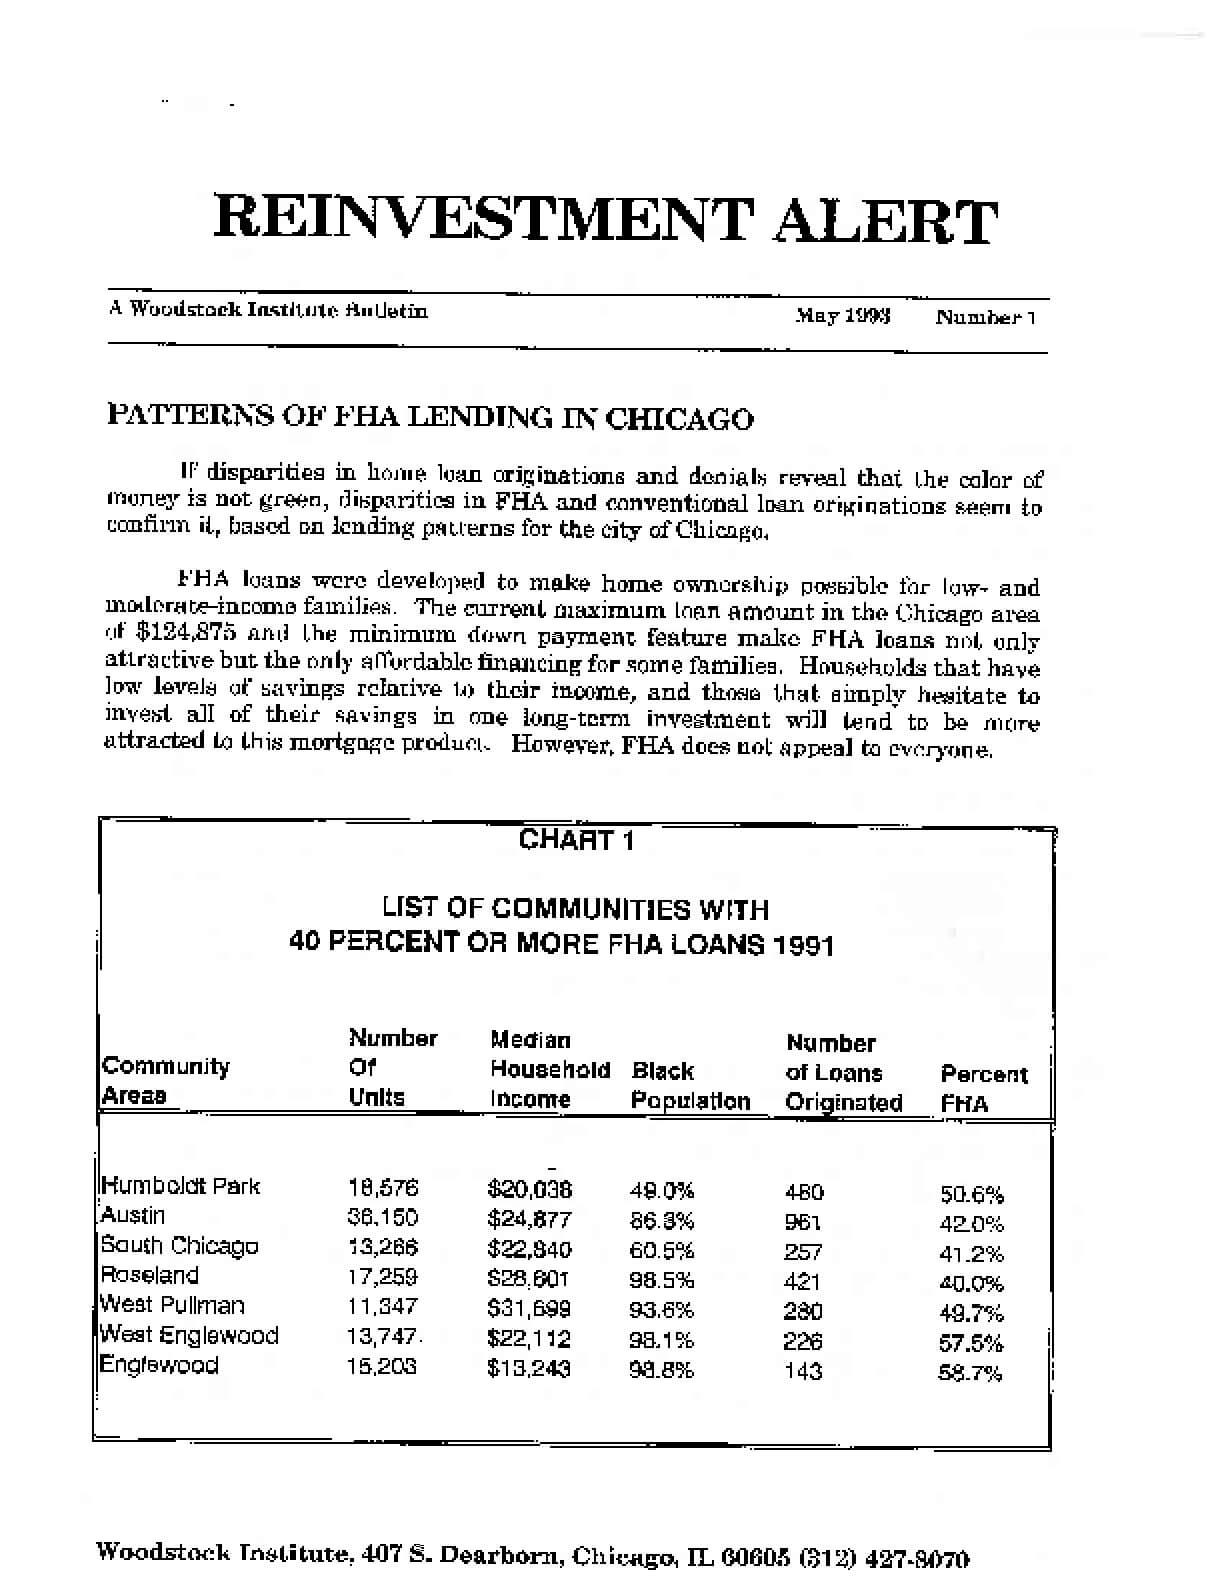 Reinvestment Alert #1: Patterns of FHA Lending in Chicago